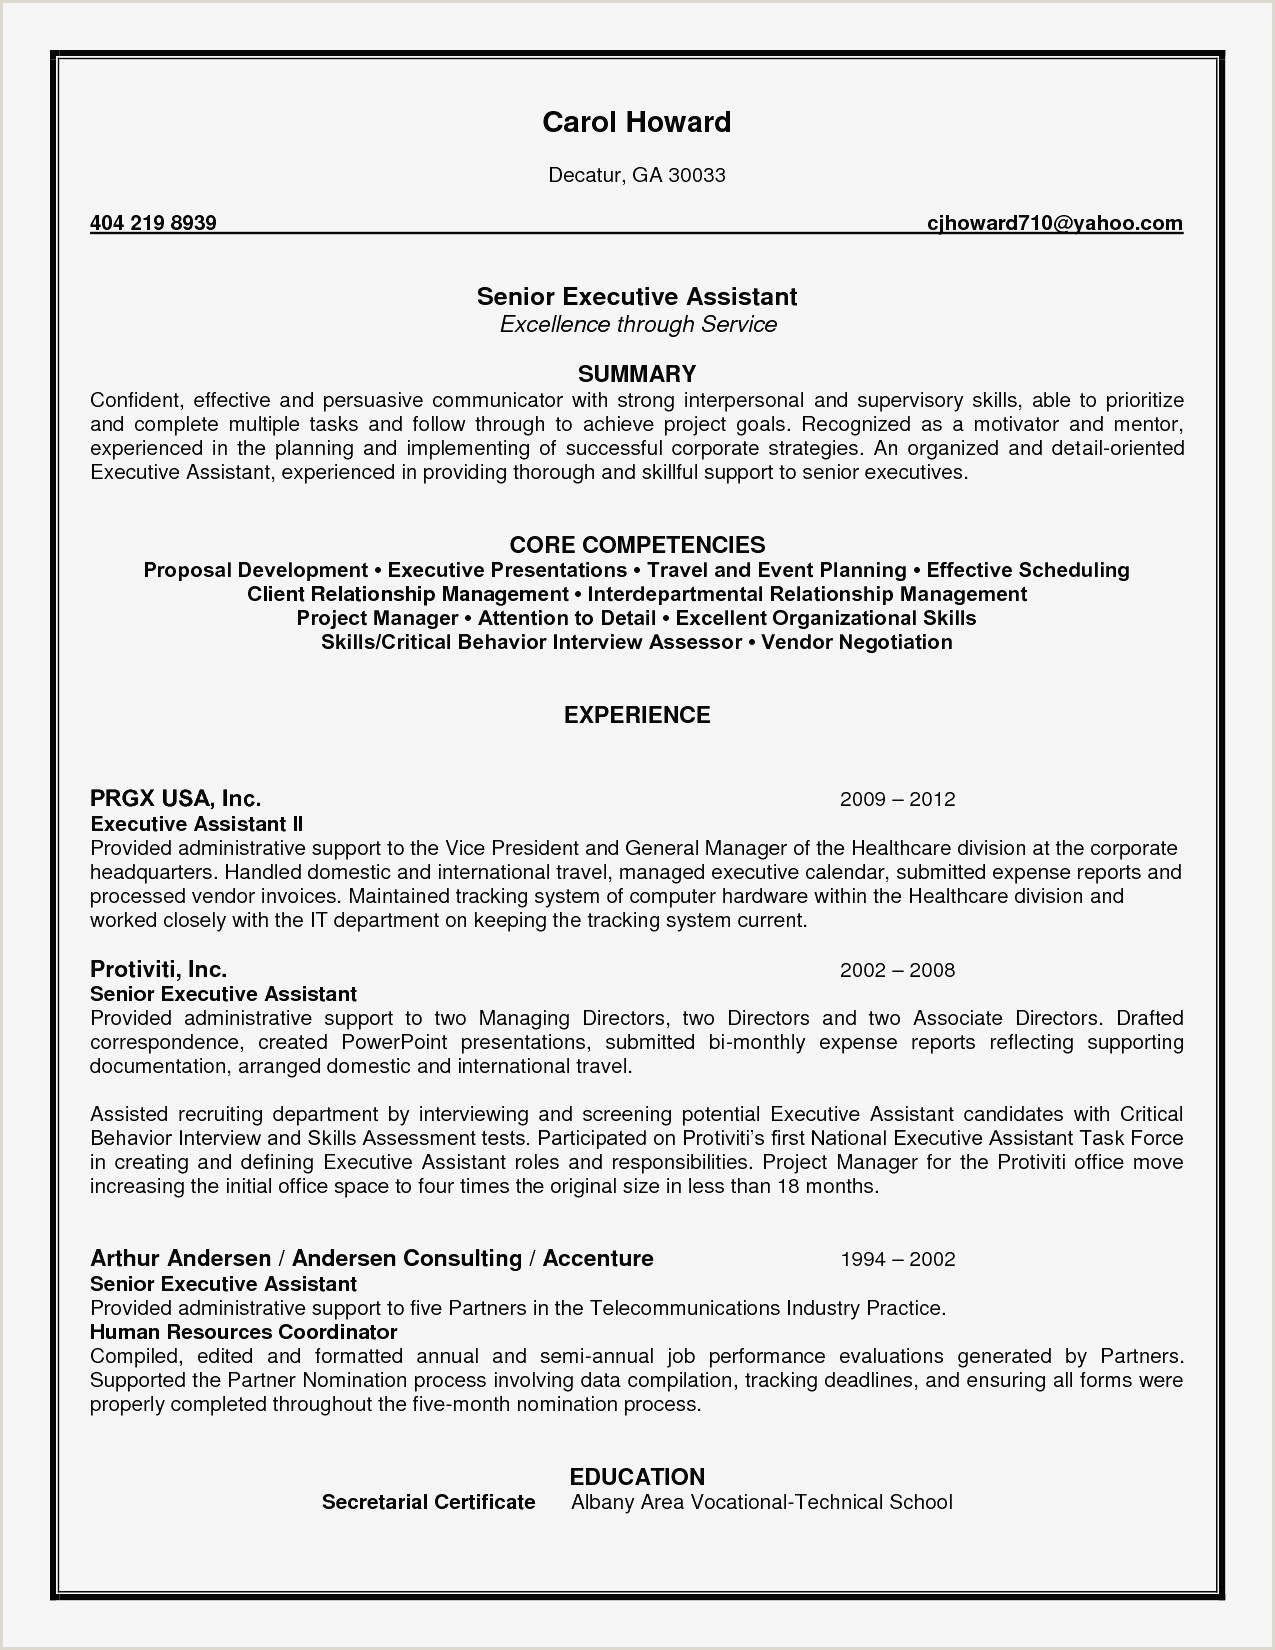 Resume format for Job Purpose Cv Cadre Dirigeant Magnifique Simple Job Resume Examples